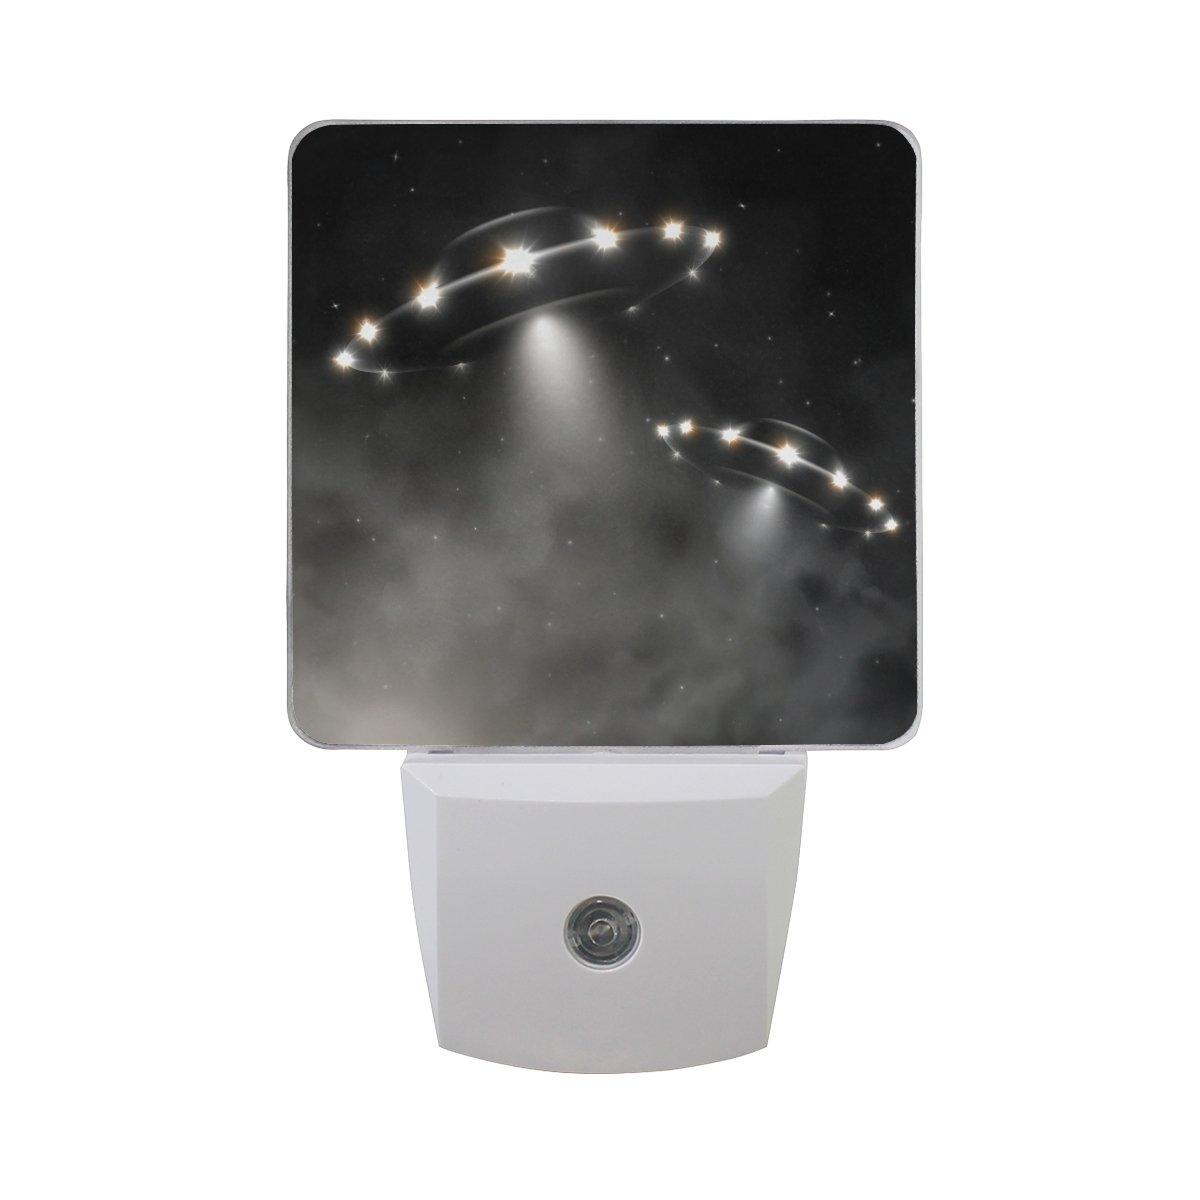 XinmingダイナミックUFO Elephant LEDセンサー夜間ライト超明るい電源Dusk to Dawnセンサーベッドルームキッチンバスルームトイレ廊下階段エネルギー効率的なコンパクト(2パック) XinMing-003 B07CVCQ951  Dynamic Ufo